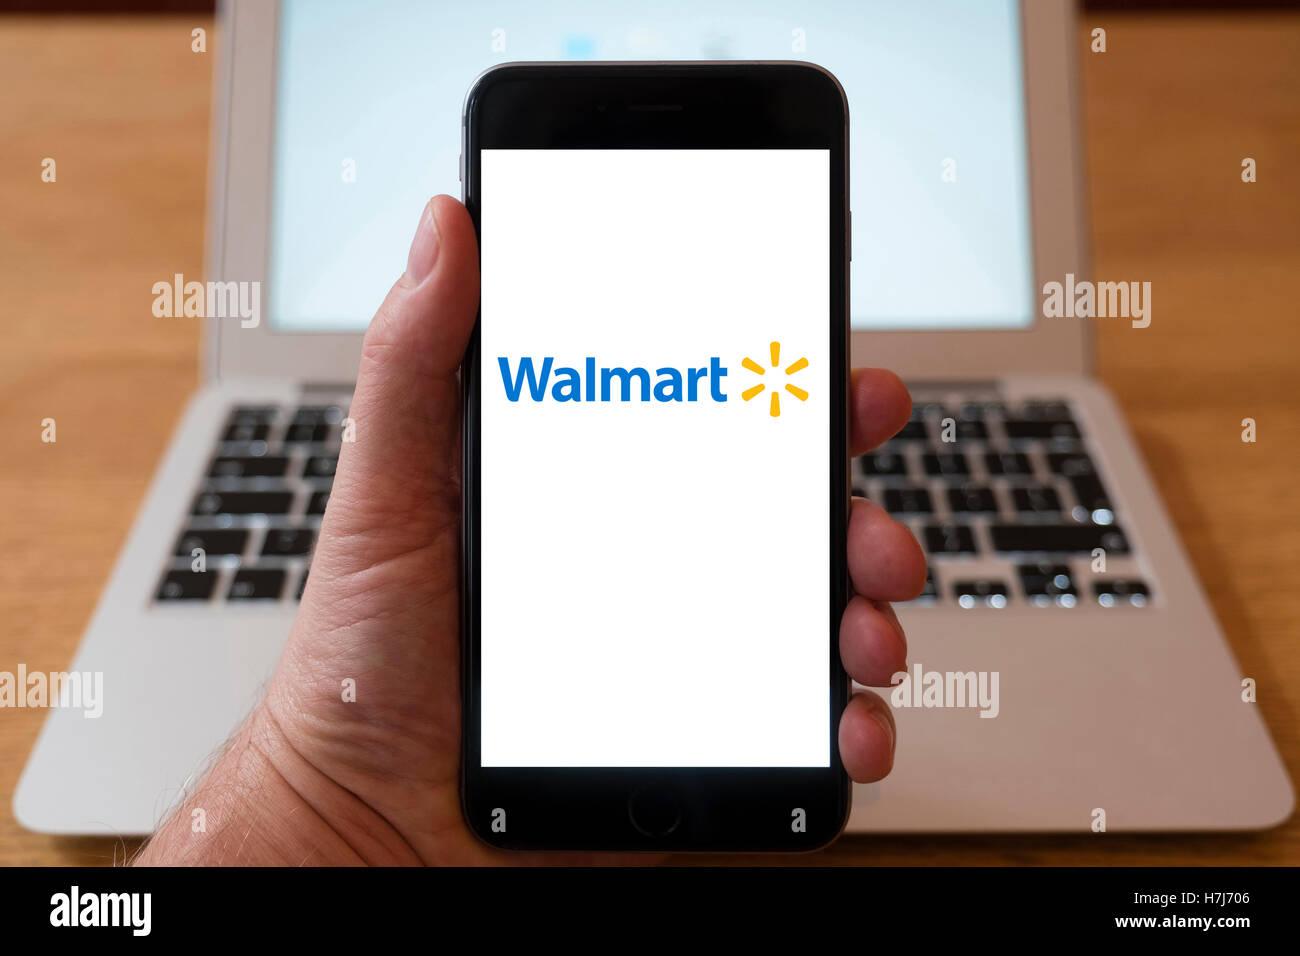 Using iPhone smartphone to display logo of Walmart , US multinational retail corporation - Stock Image